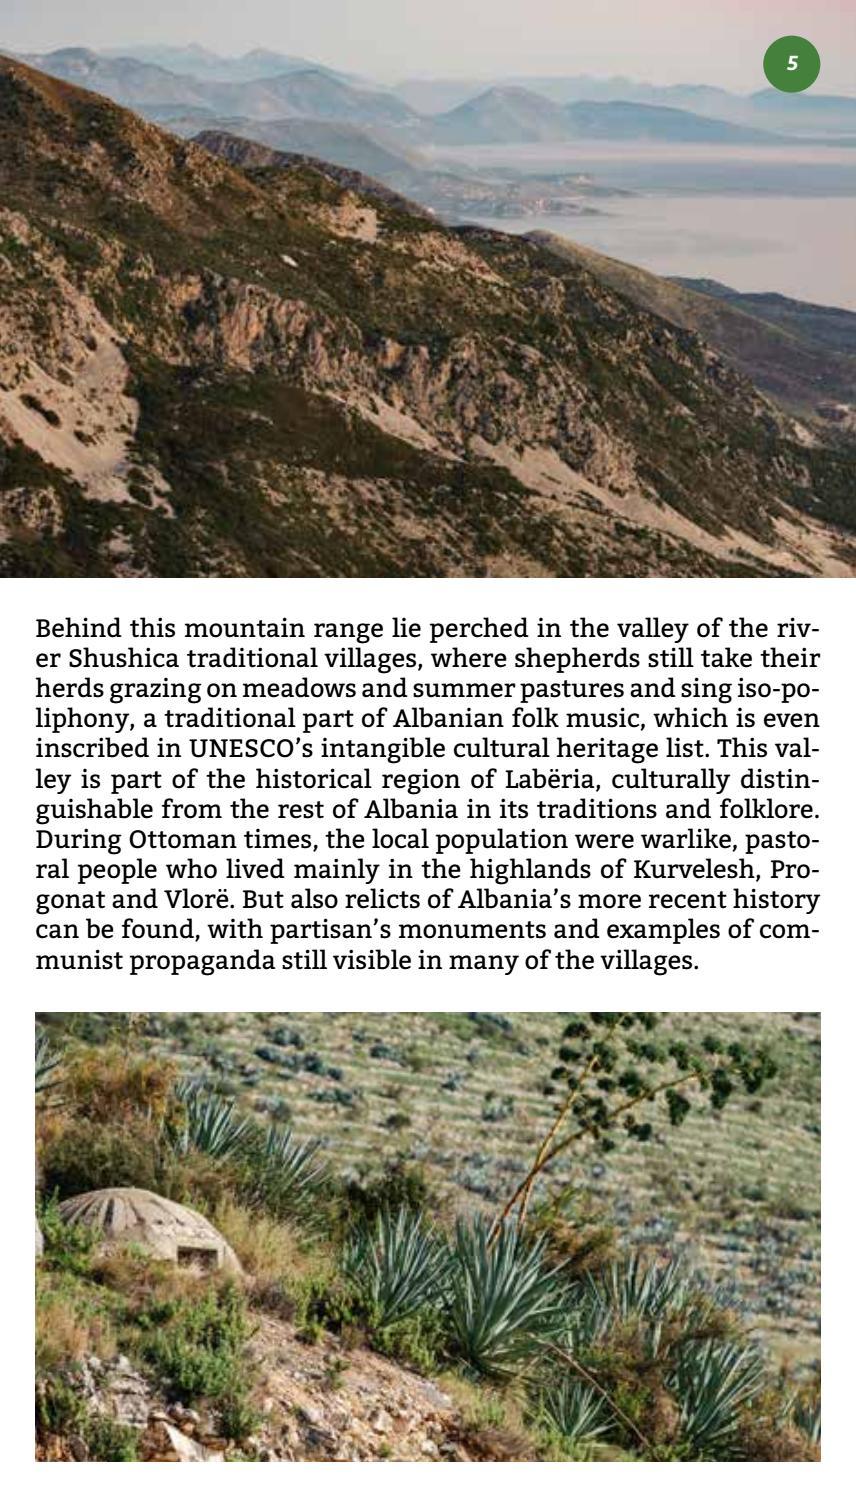 Hiking Trails in Himara Region page 5